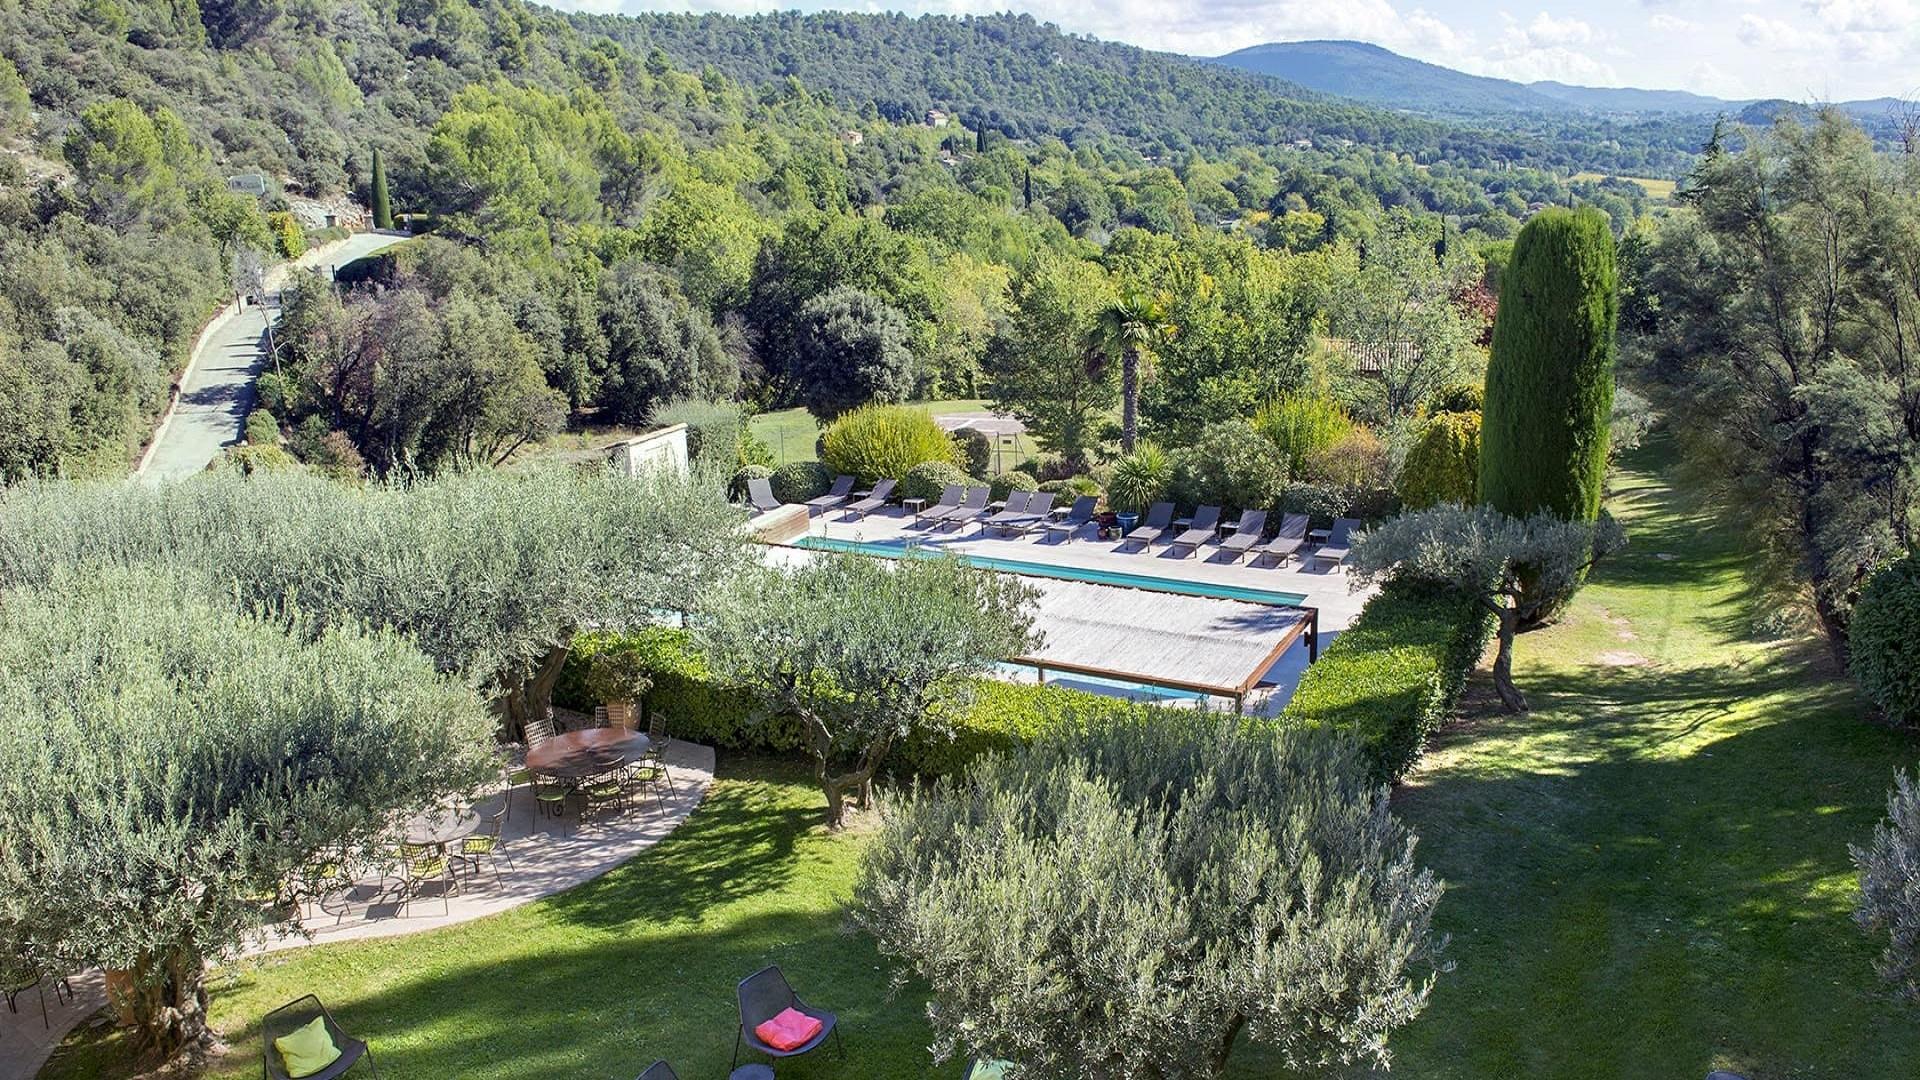 bastide-du-calalou-var-paca-provence-piscine-seminaires-de-caractere